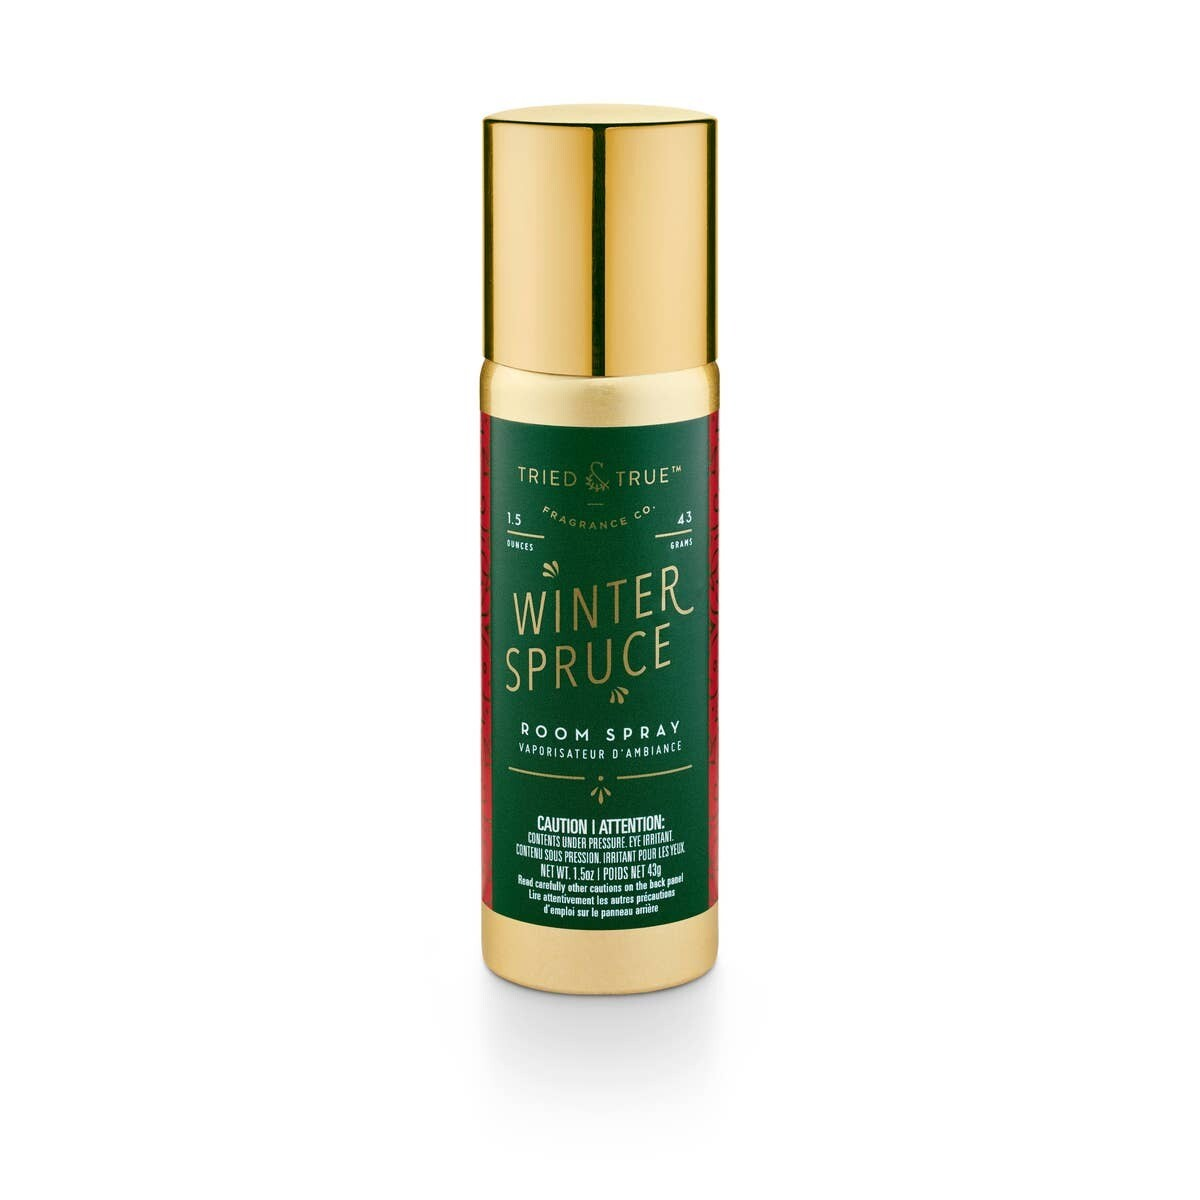 Winter Spruce Room Spray